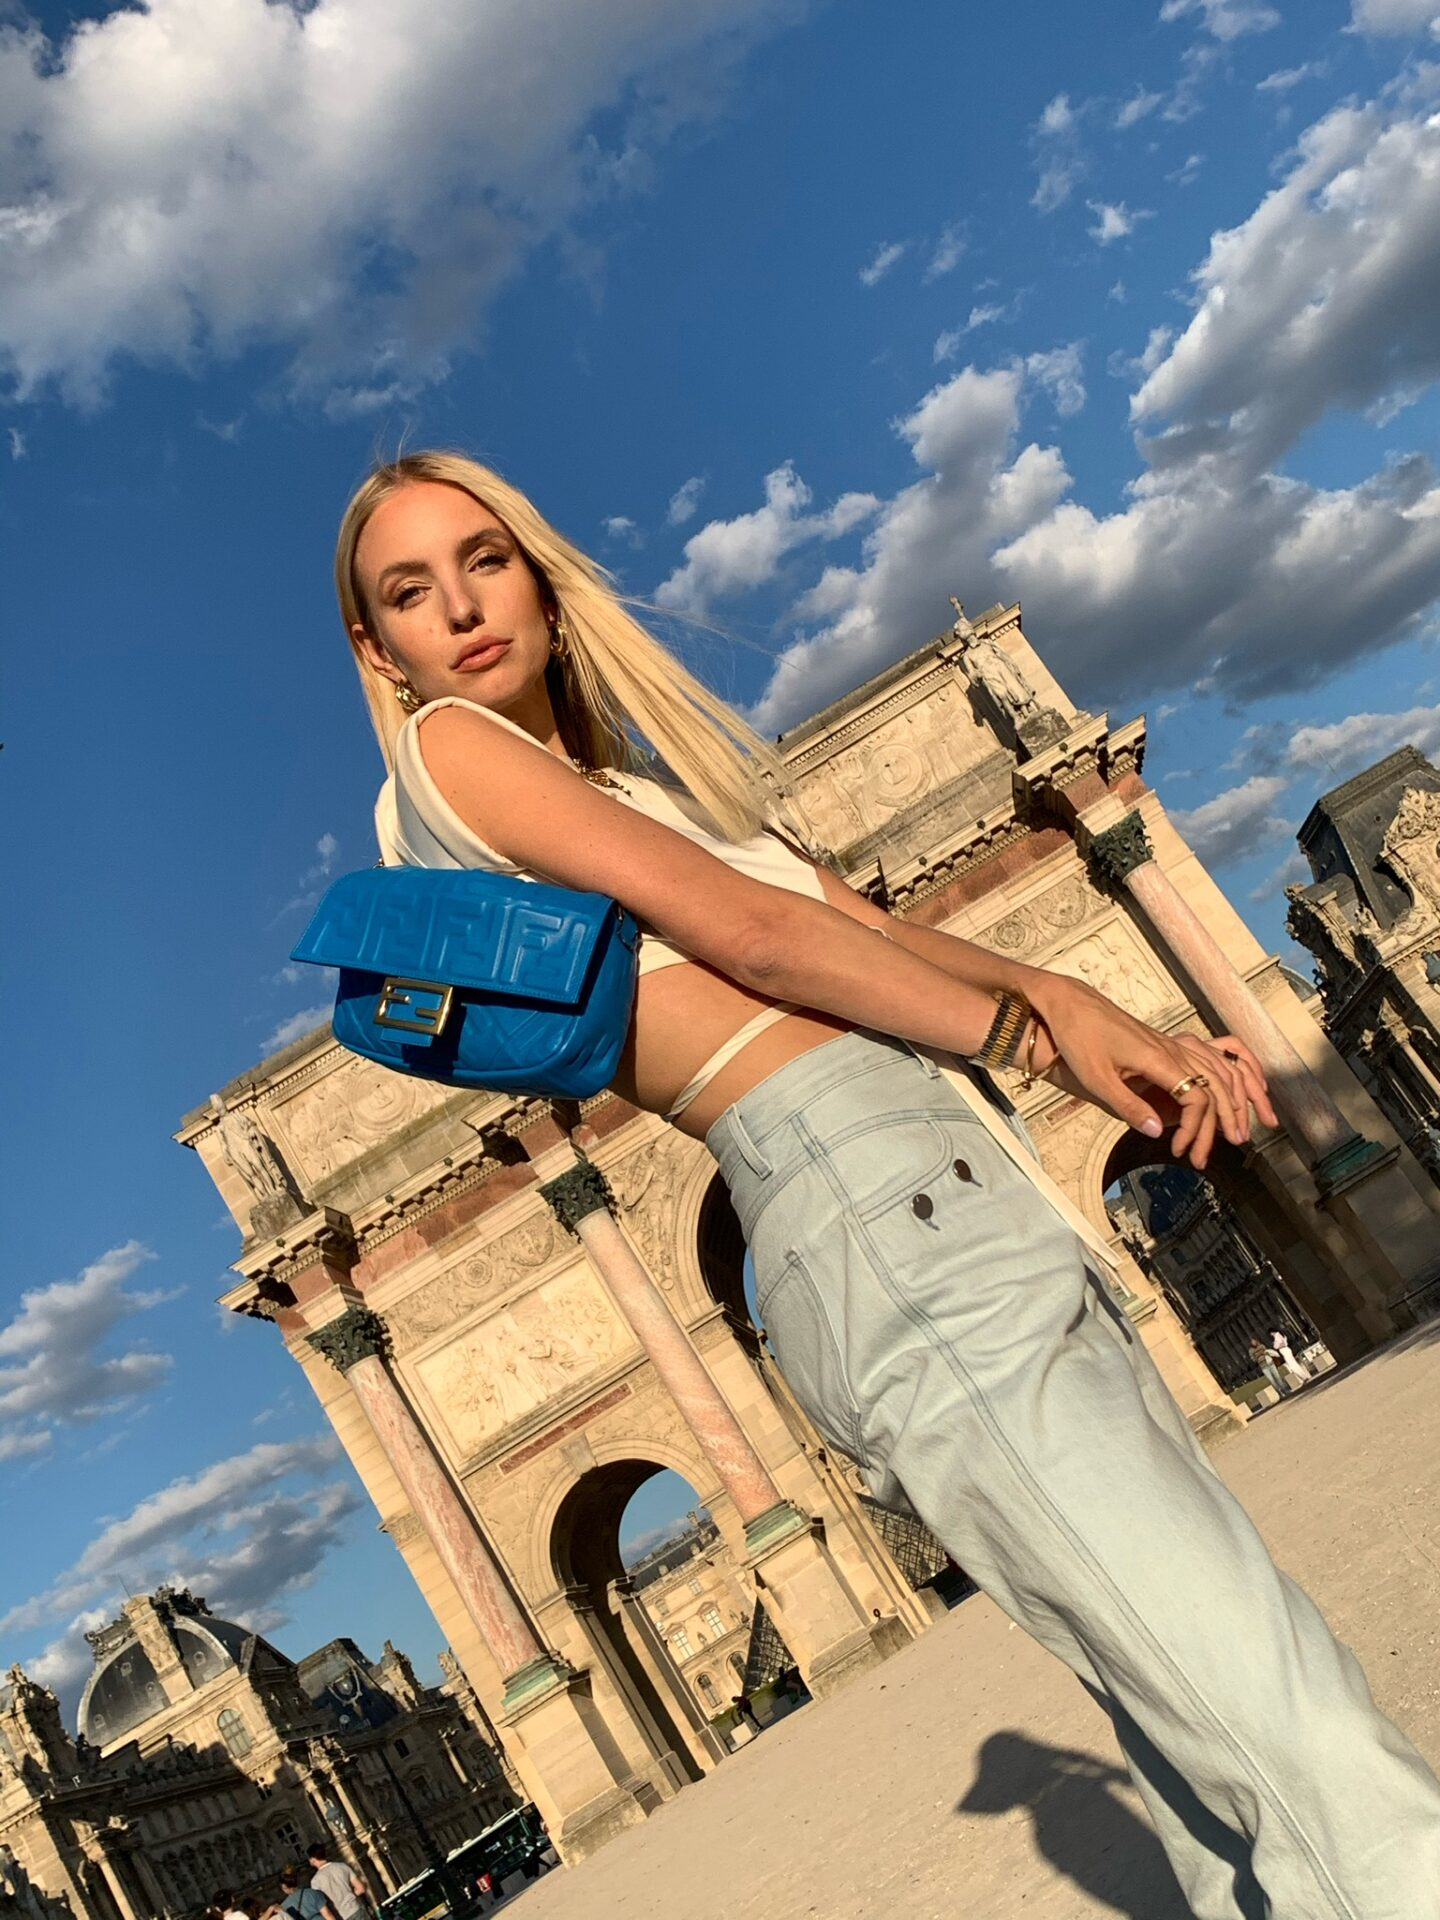 Fendi Baguette and Louvre